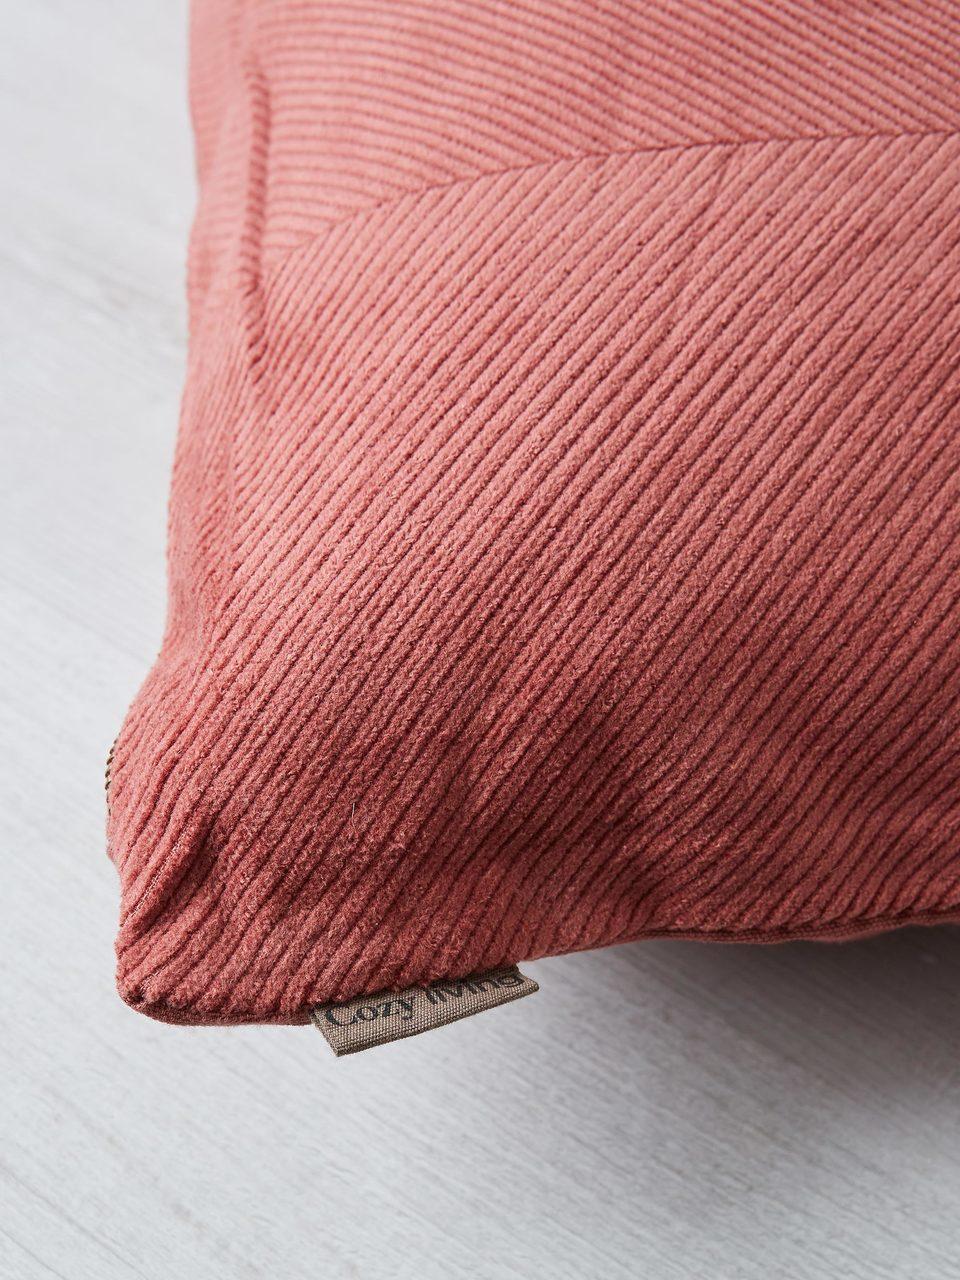 Cozy Living Rouge Pink Herringbone Textured Rectangular Corduroy Cushion